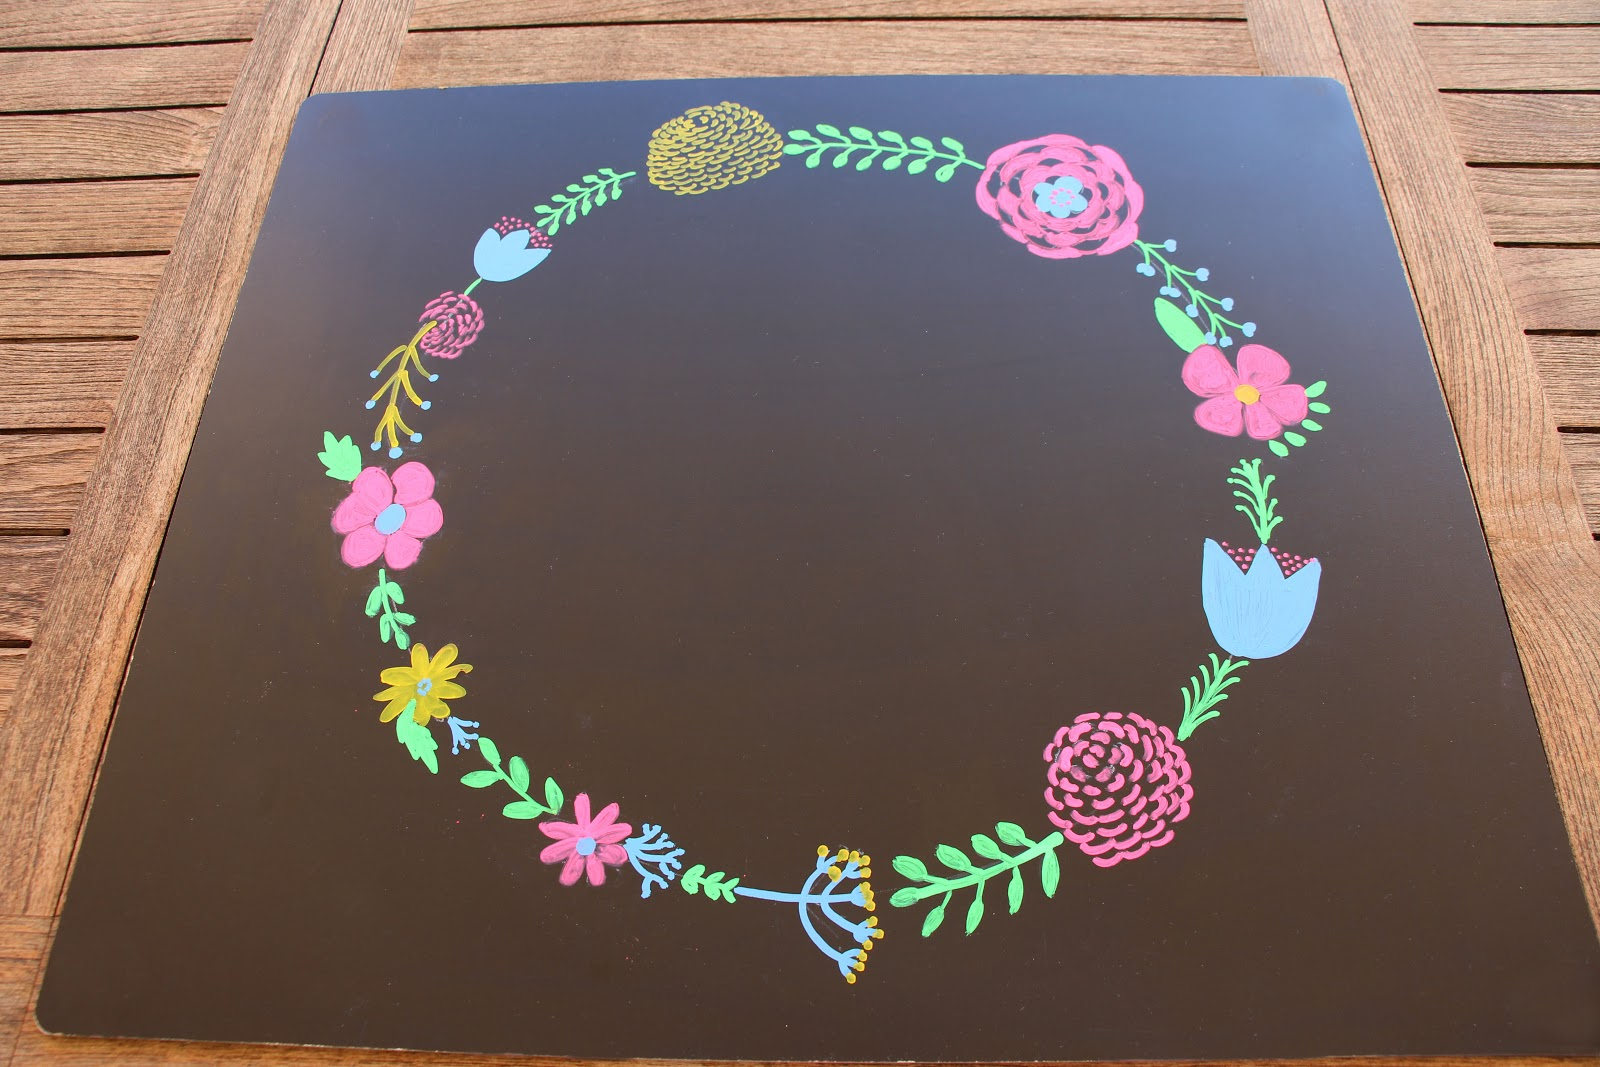 Letras Con Flores Para Decorar